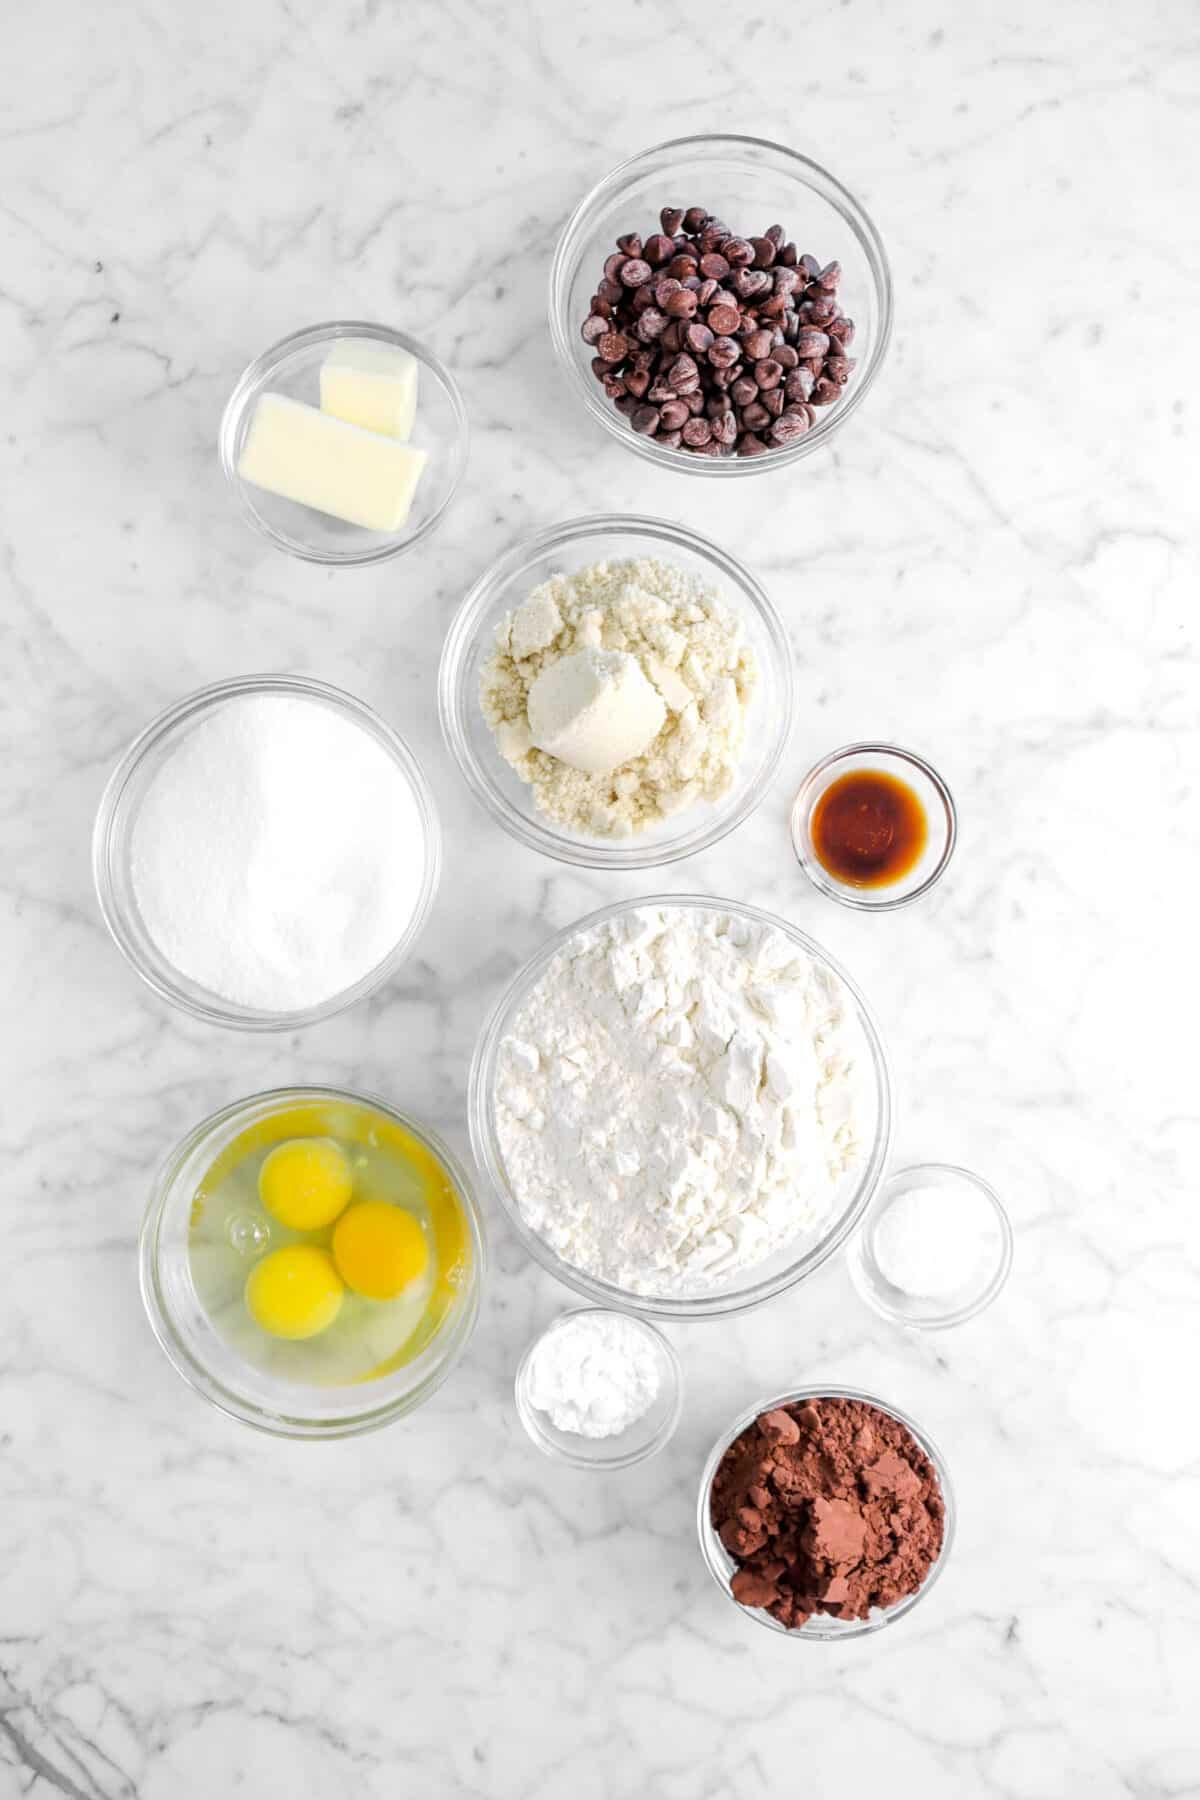 chocolate chips, butter, almond flour, vanilla, sugar, flour, eggs, salt, baking powder, and cocoa powder in glass bowls